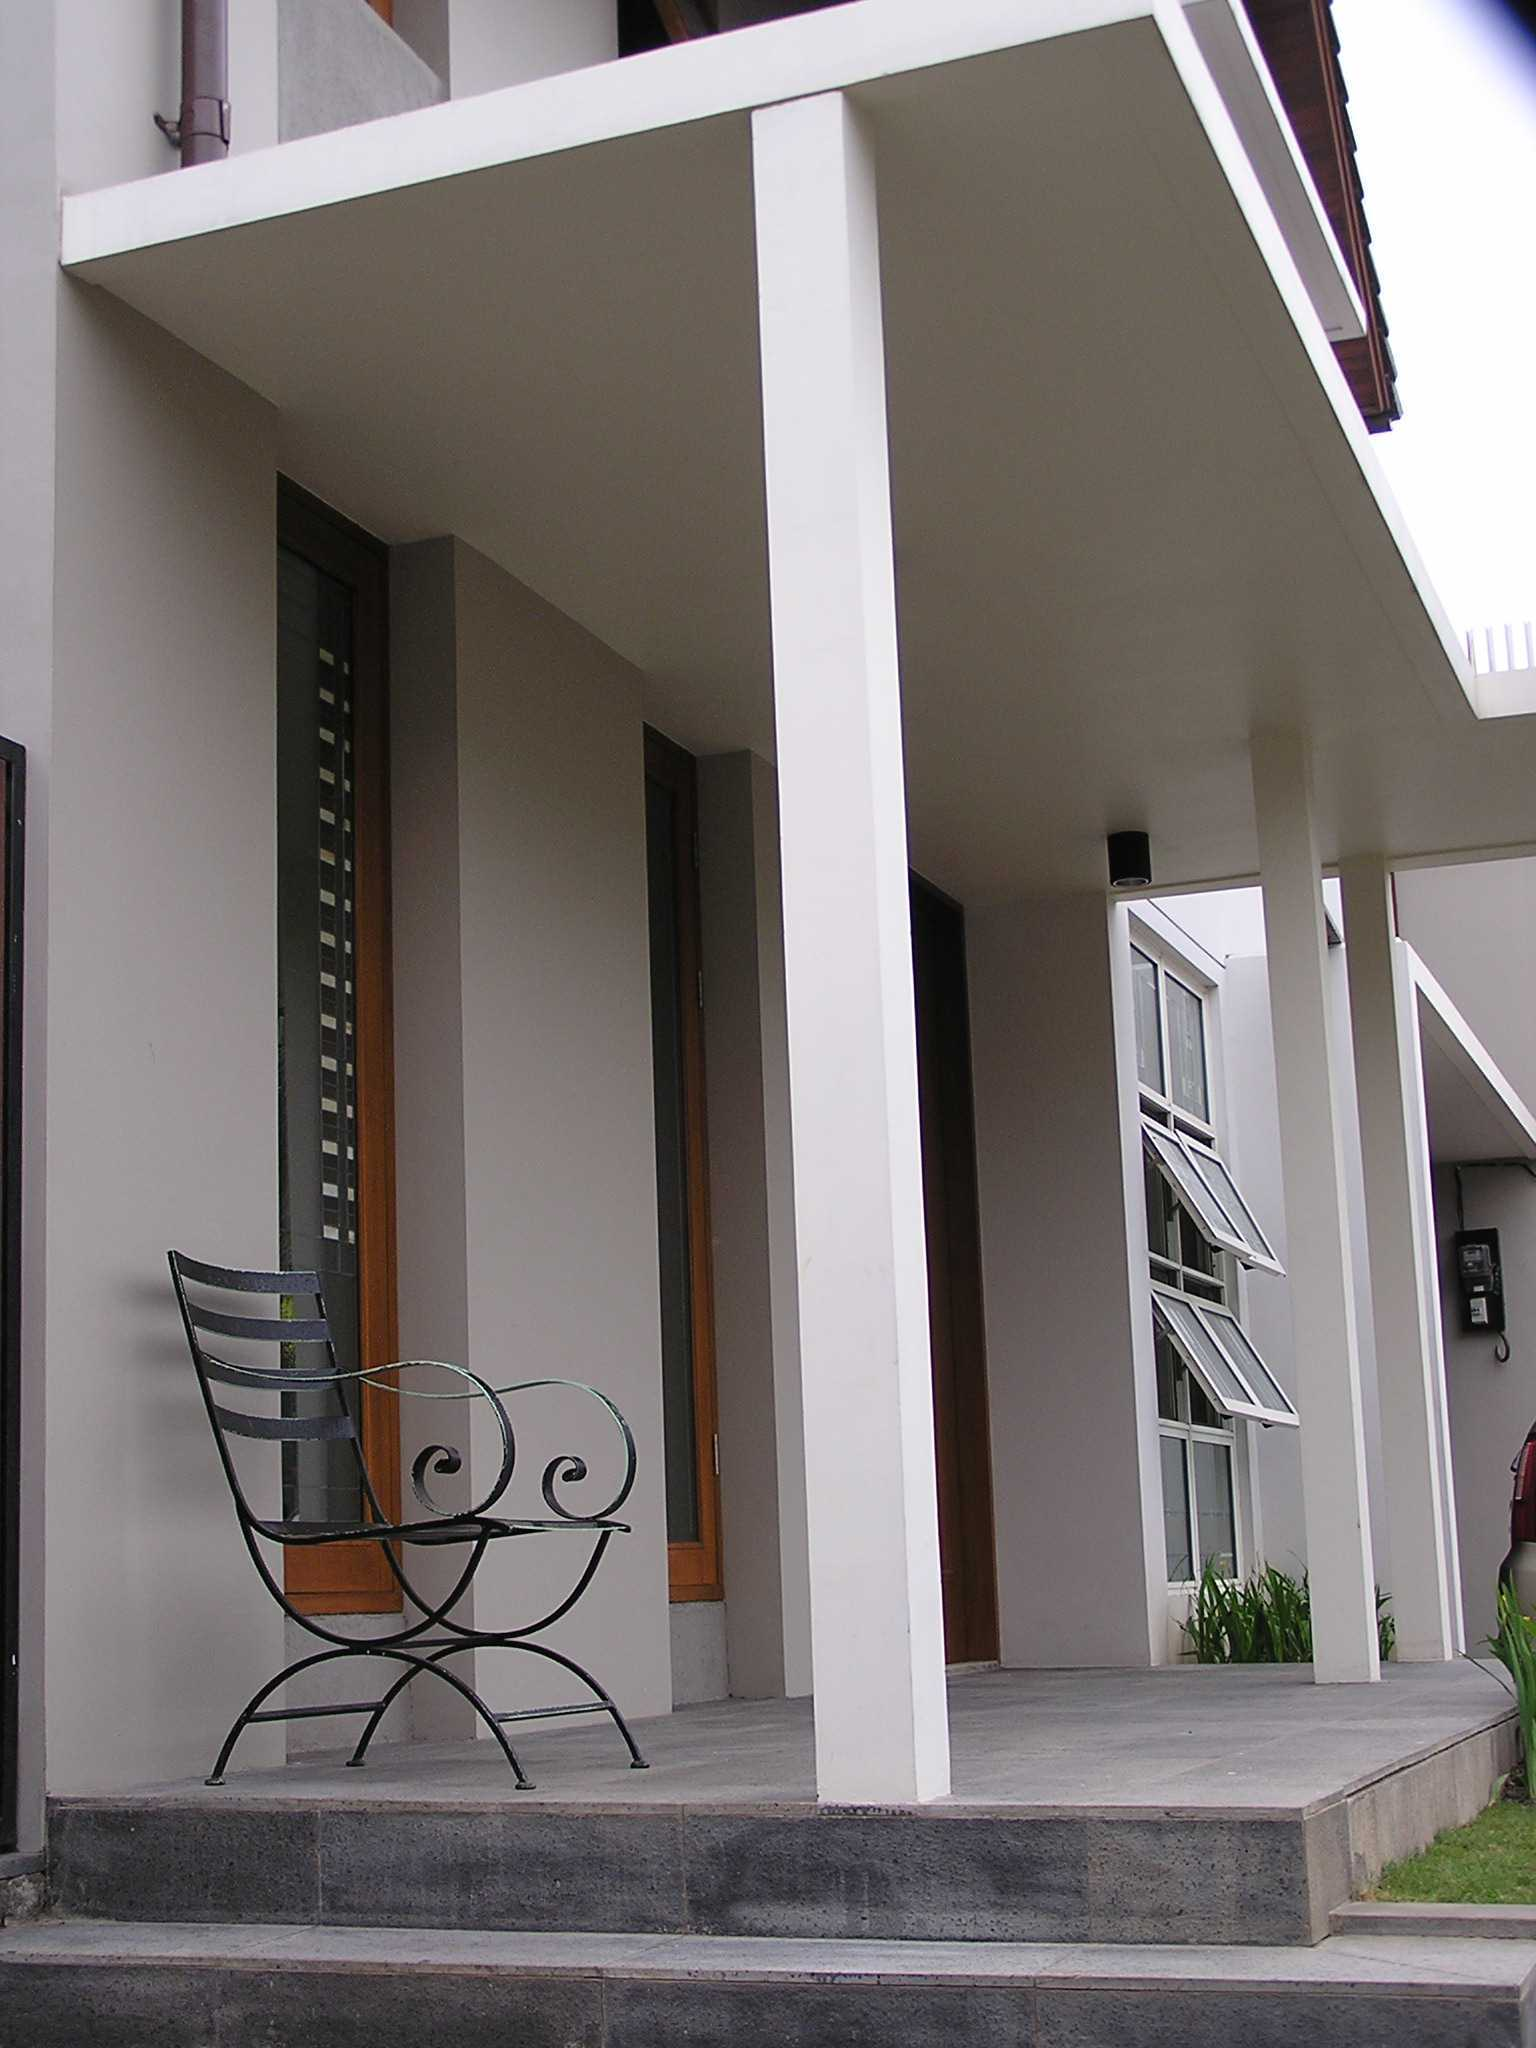 Pt. Garisprada Tomang Residence Tomang, Grogol Petamburan, West Jakarta City, Jakarta, Indonesia Tomang Terrace Kontemporer  22240